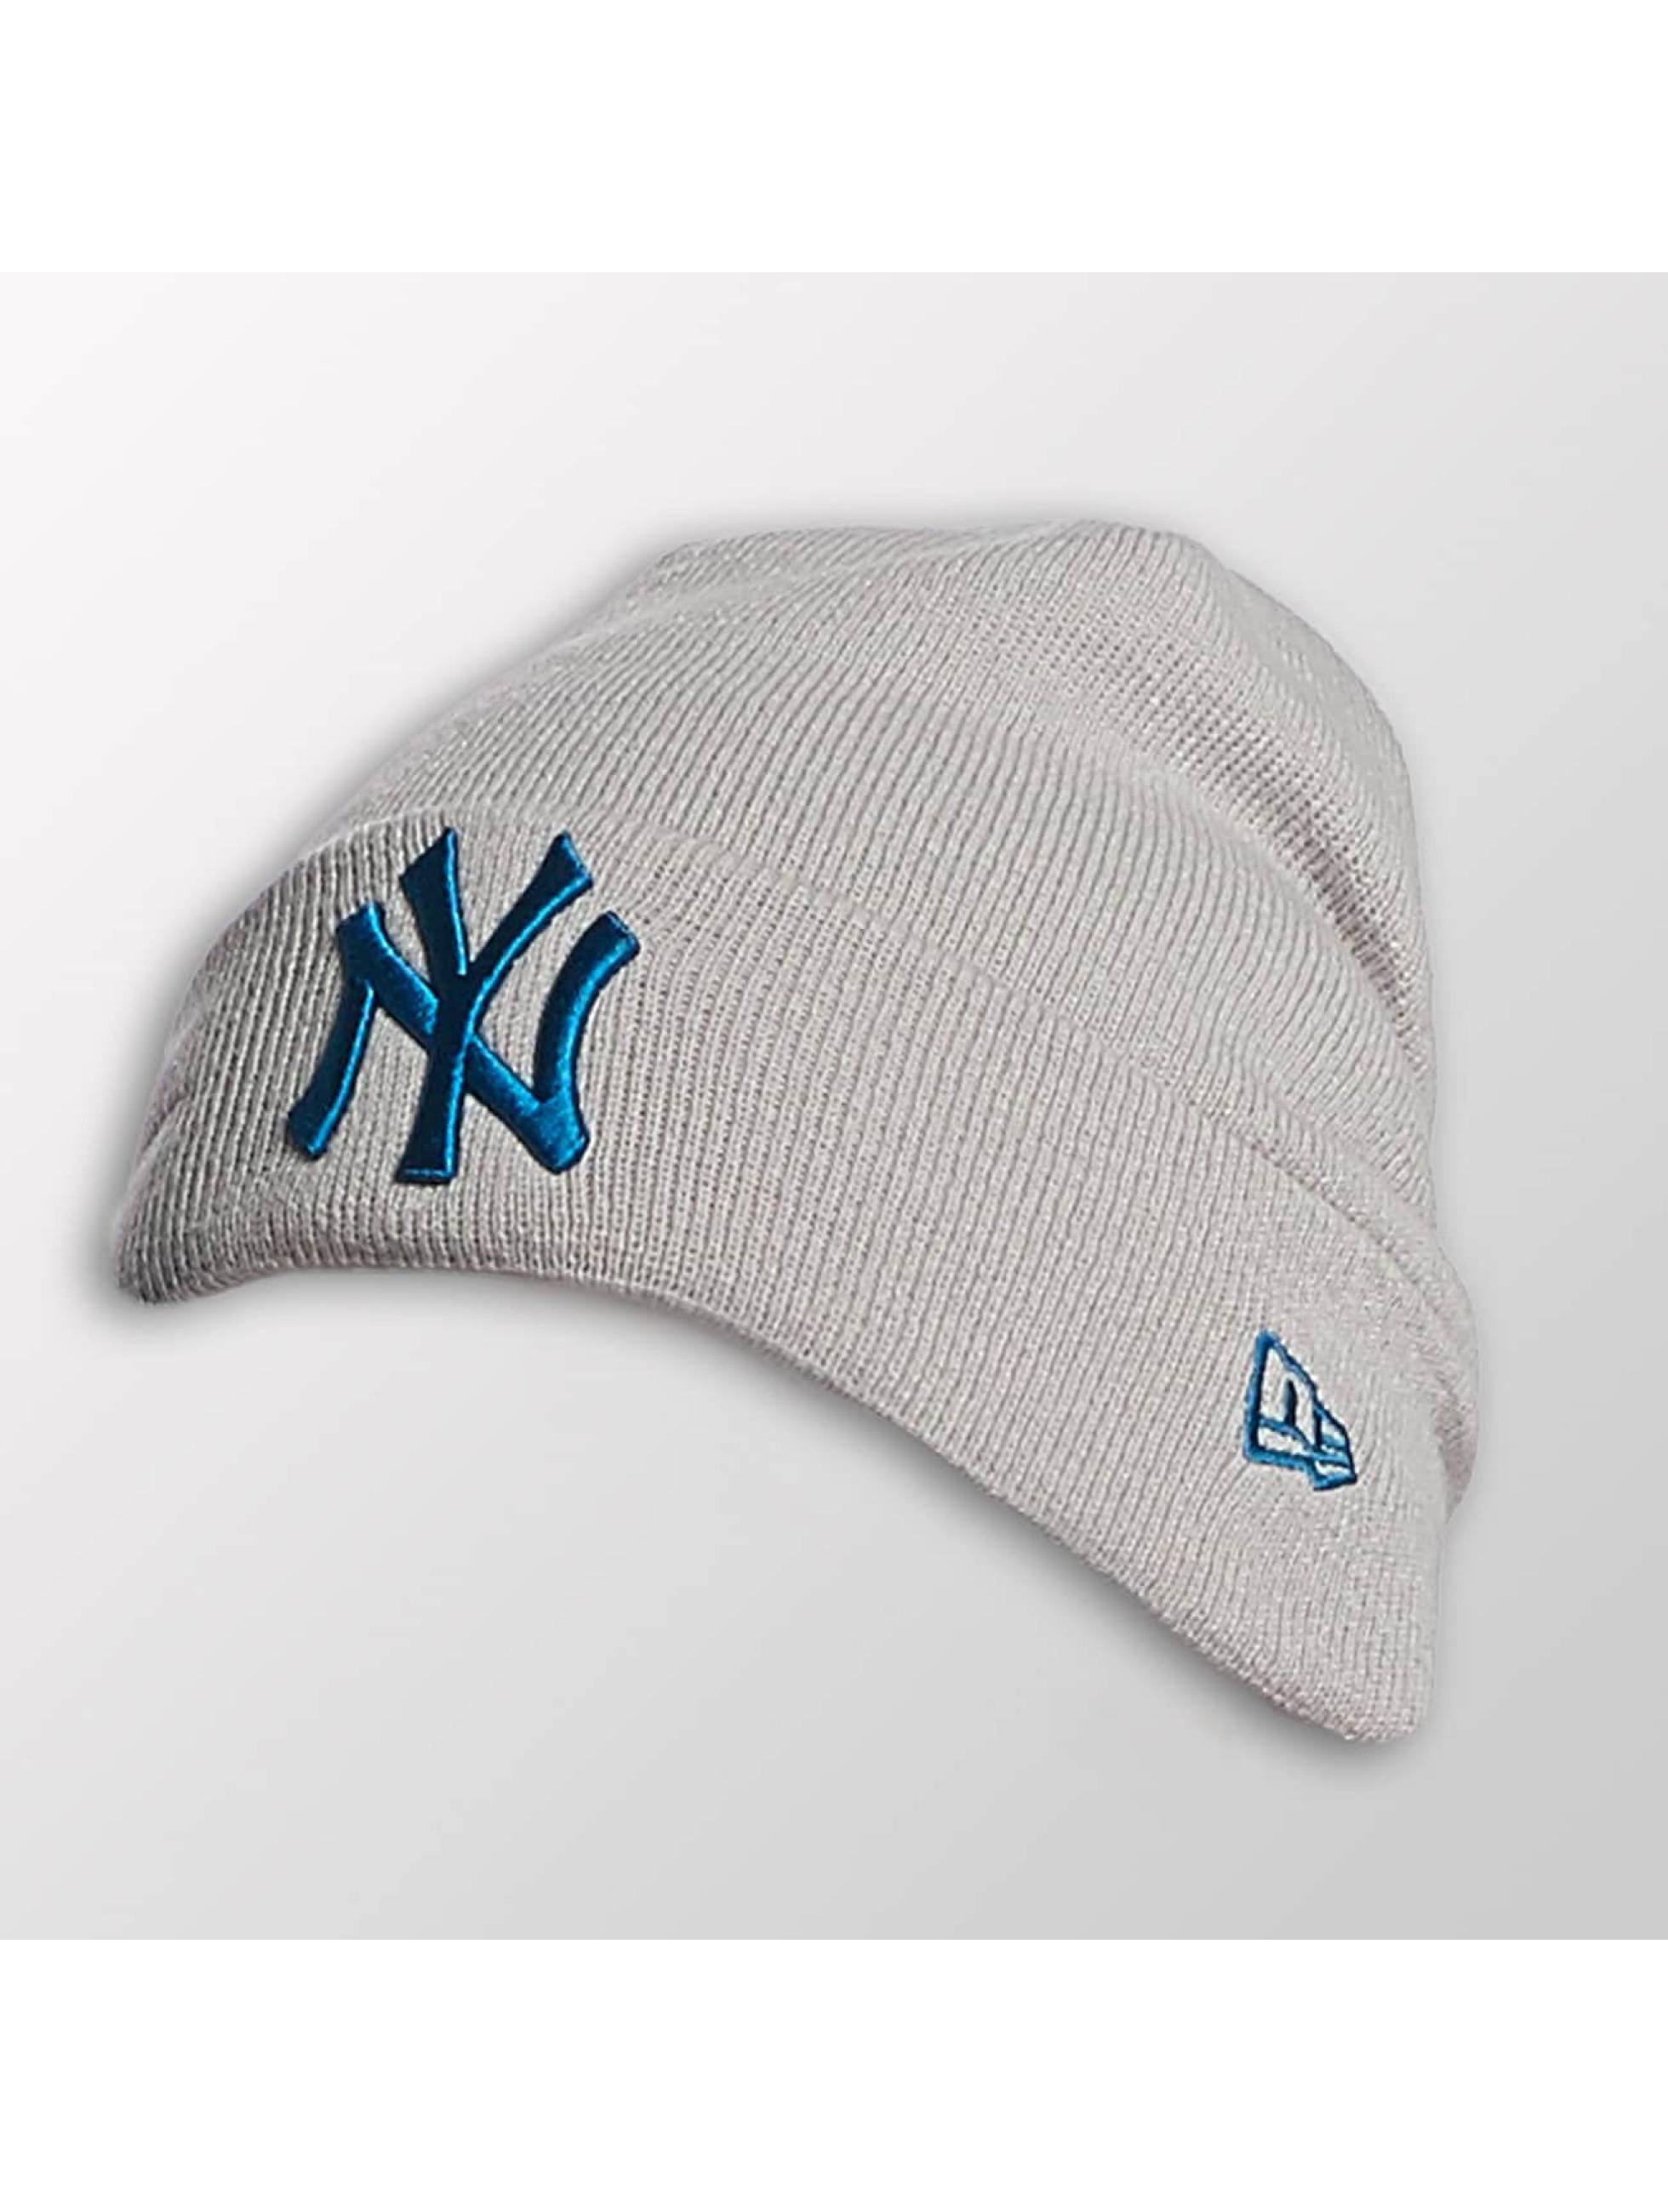 New Era Männer,Frauen Beanie Seasonal Cuff NY Yankees in grau